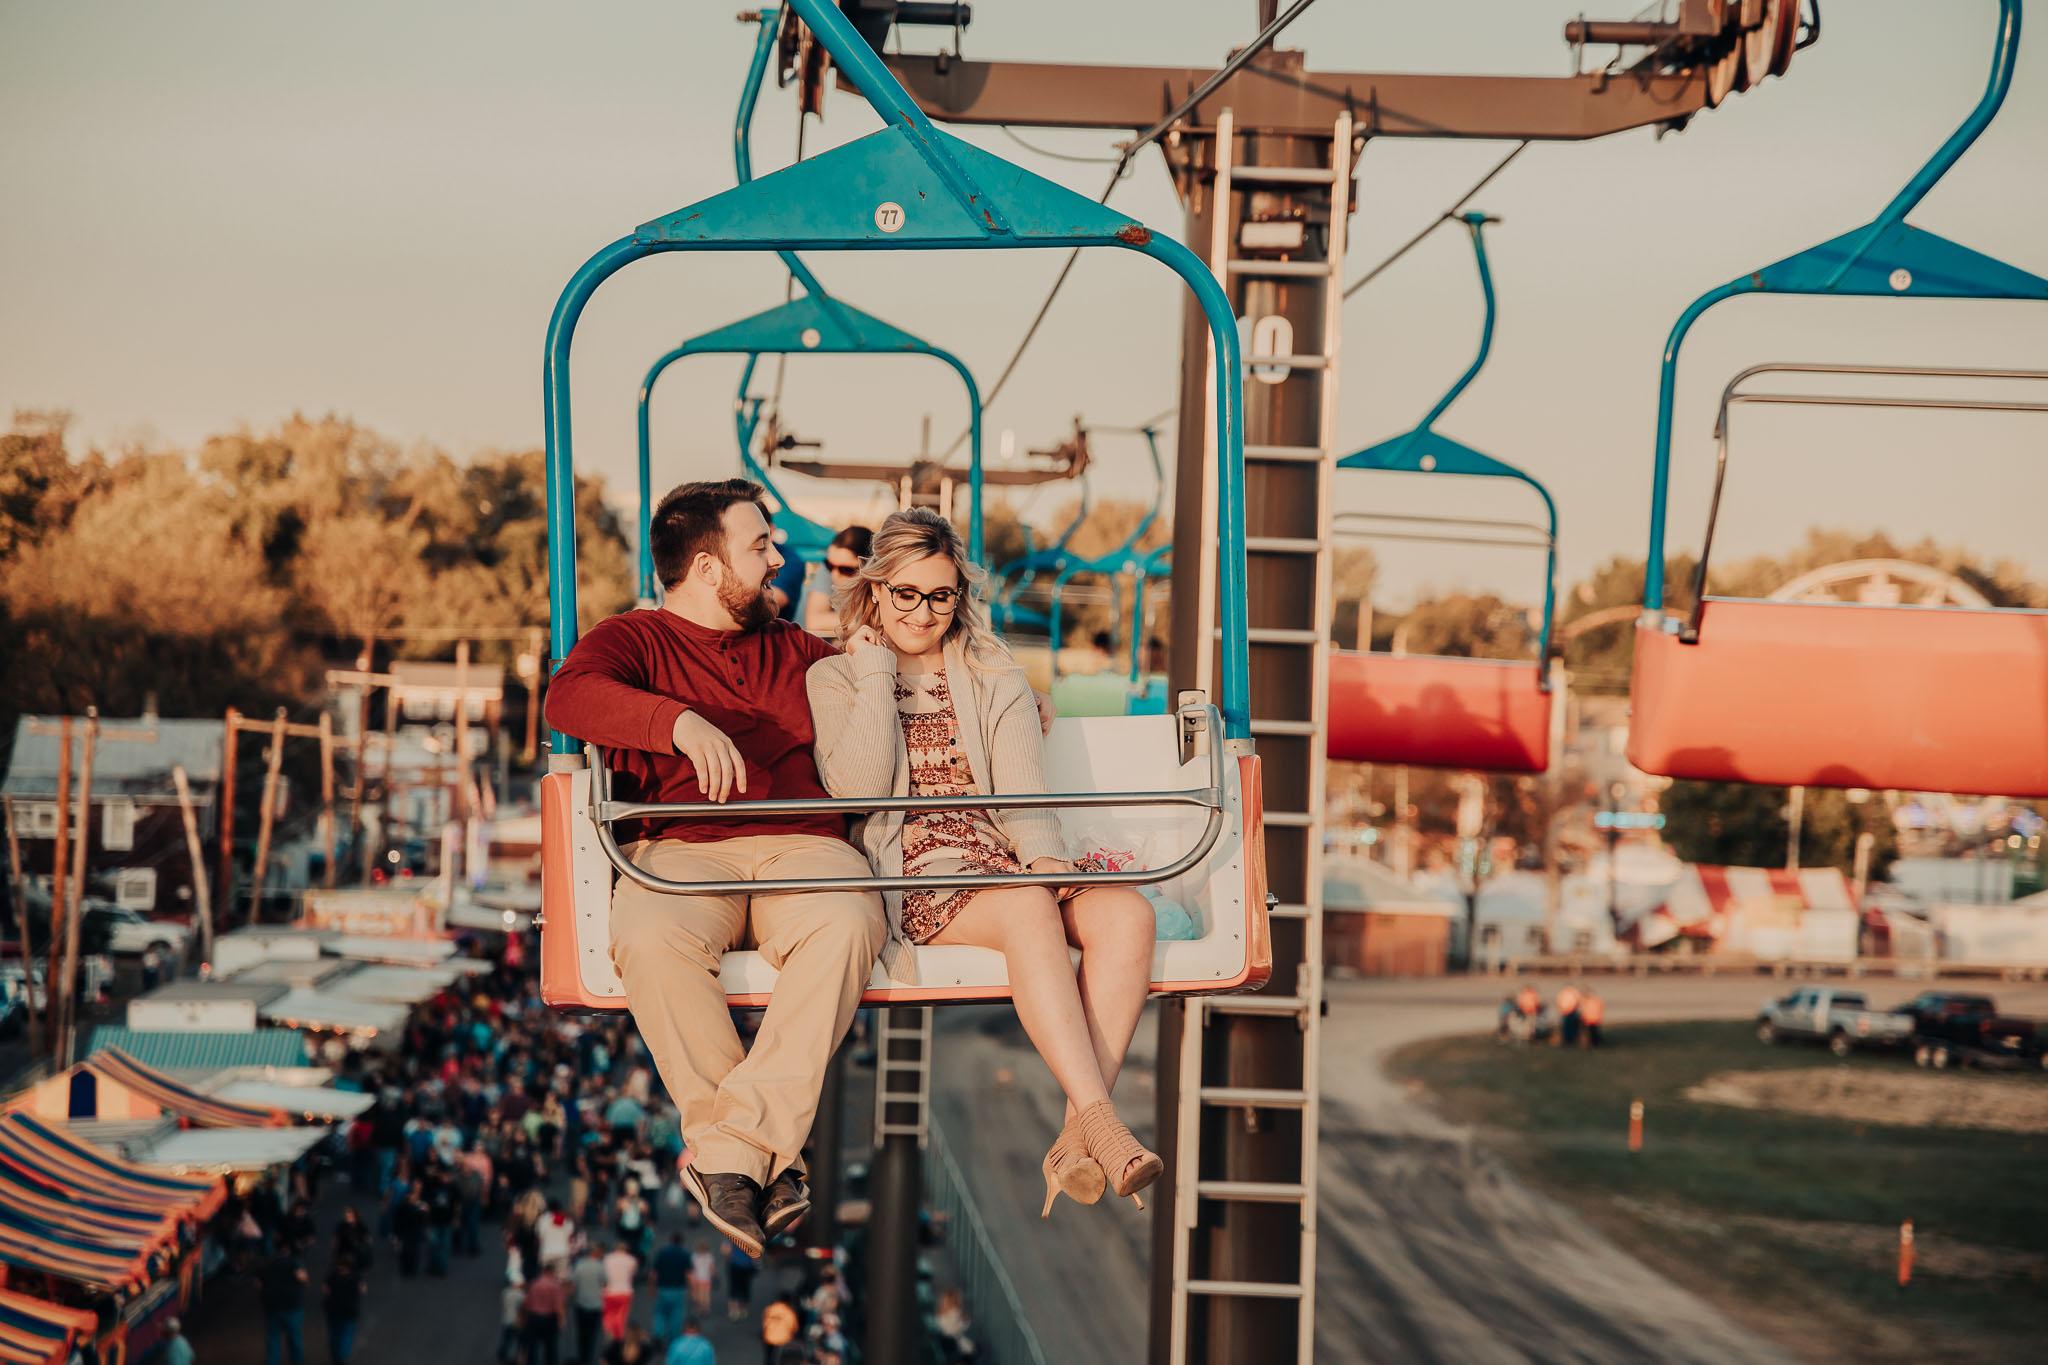 bloomsburg-fair-engagement-5466.jpg